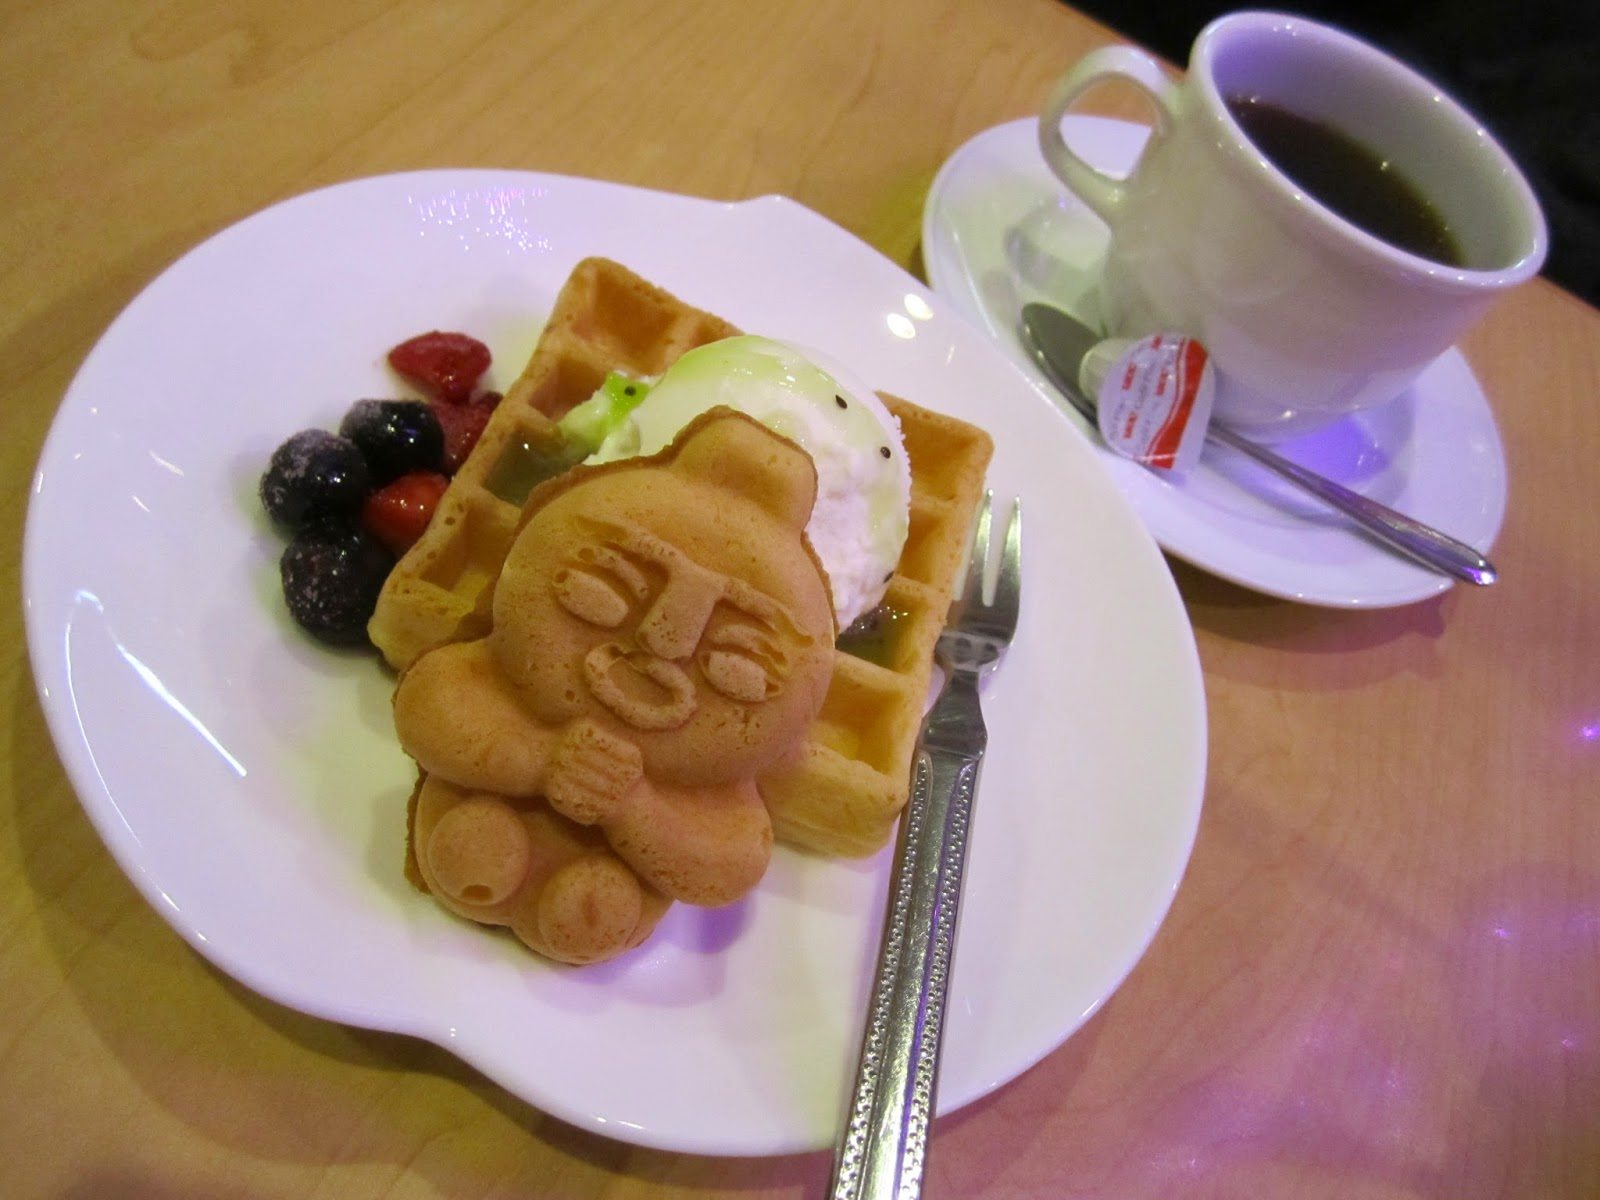 Handmade Waffle Set Minami Coffee Shop Cafe Hachinohe 手作りワッフルセット 香彩珈琲 みな実 三日町中央店